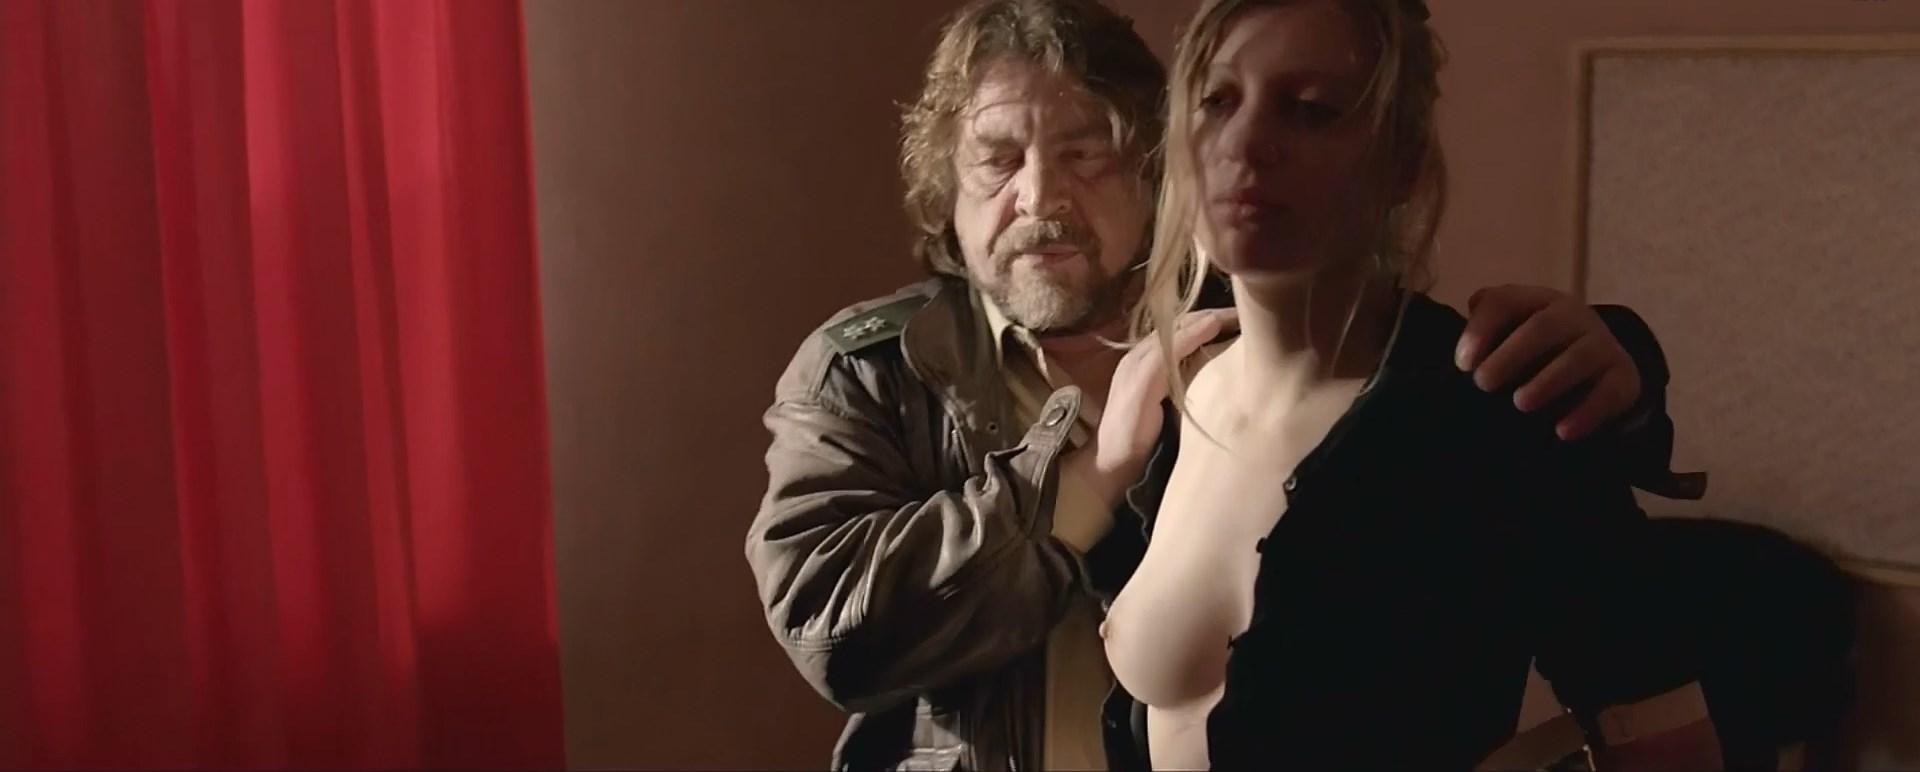 Janina Schauer nude - Tatort e937 (2015)